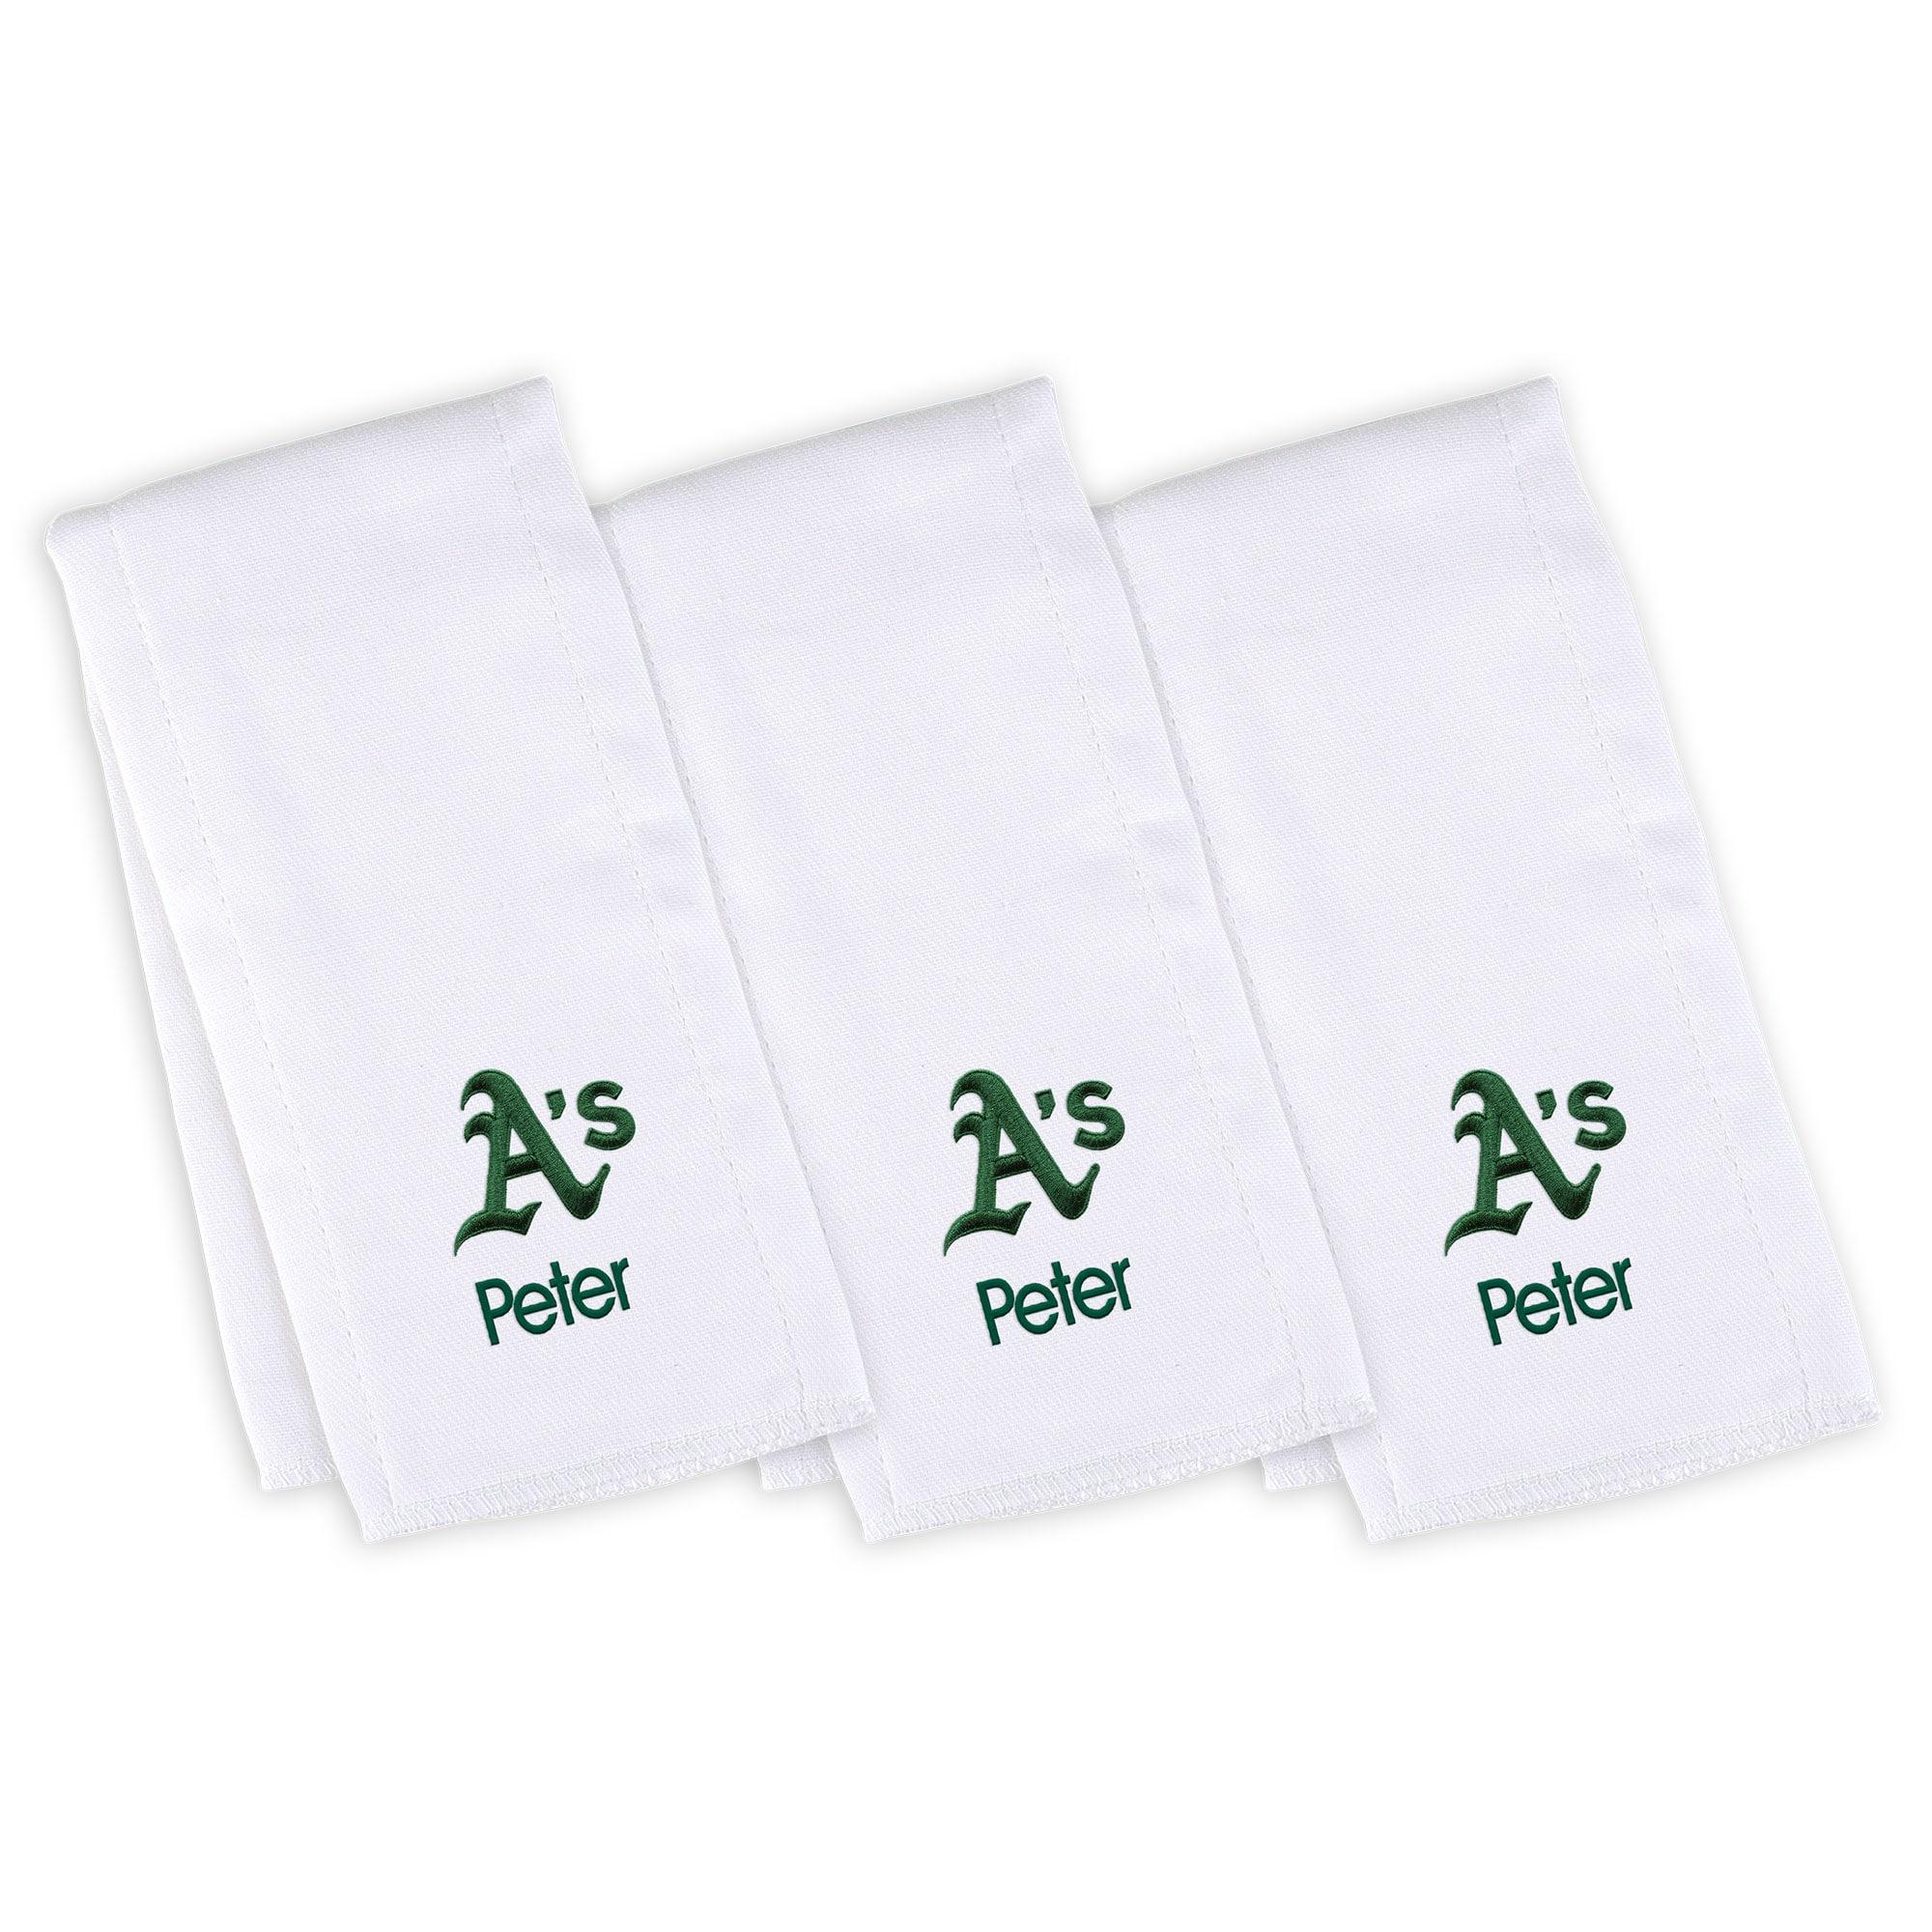 Oakland Athletics Infant Personalized Burp Cloth 3-Pack - White